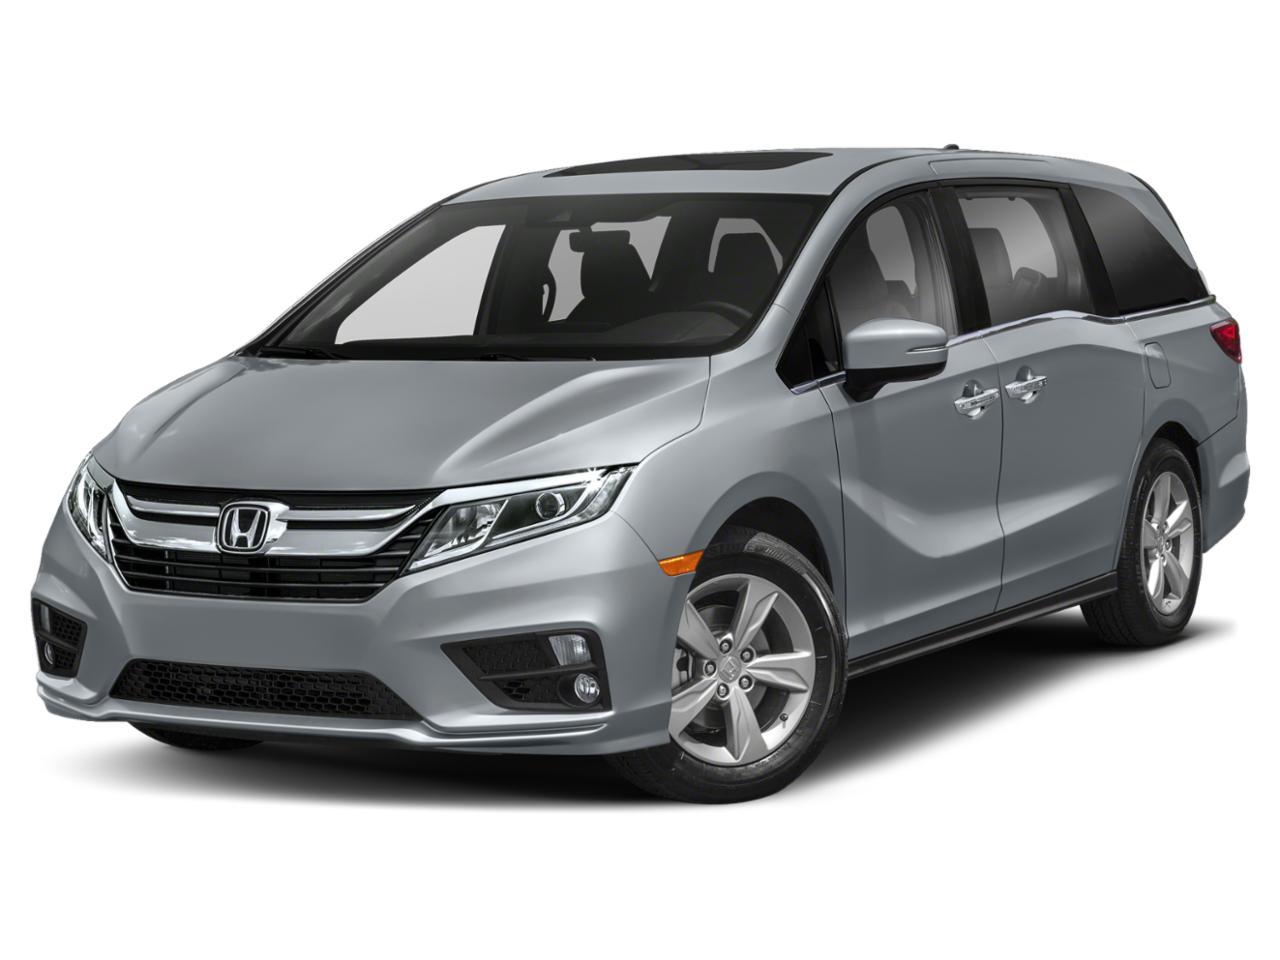 2019 Honda Odyssey Vehicle Photo in Portland, OR 97225